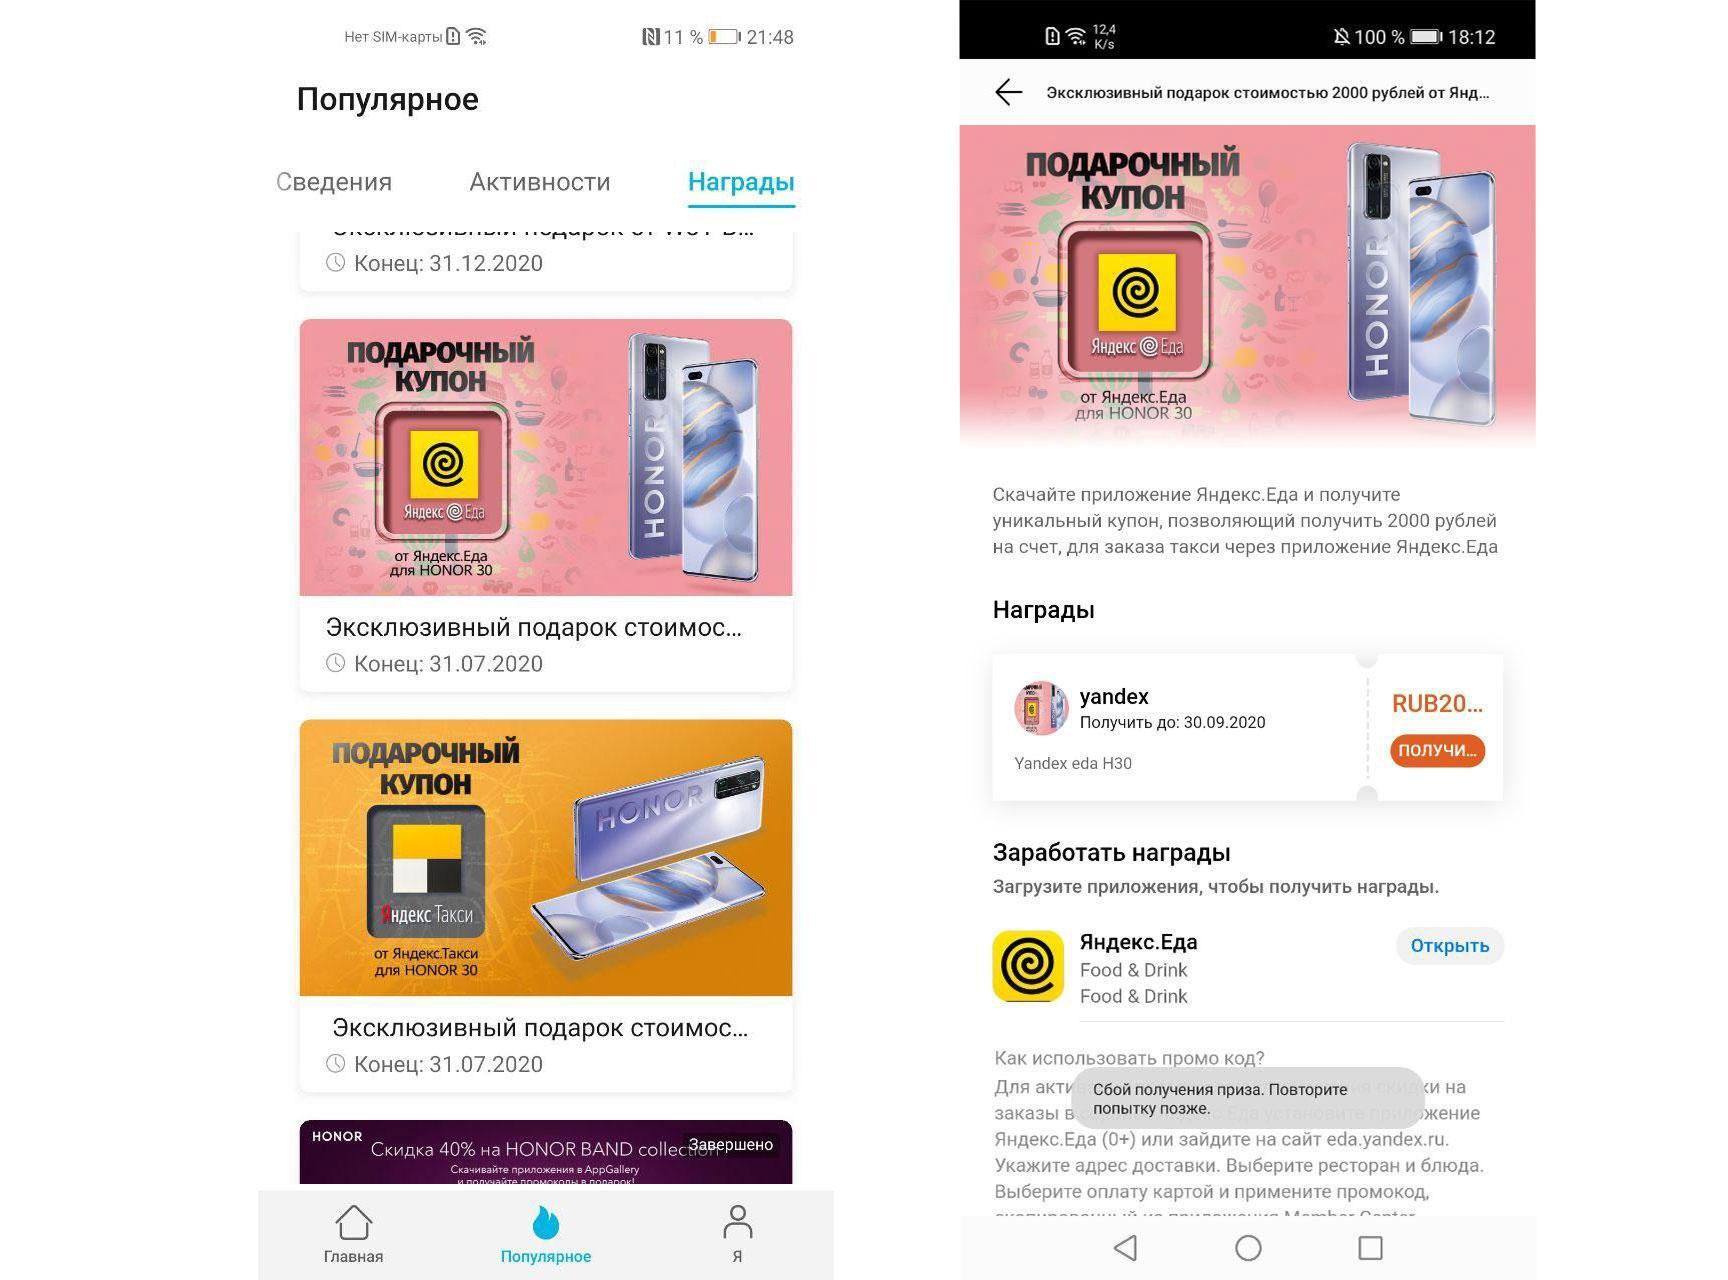 Honor кормит владельцев Honor 30, 30s, 30 Pro+на2000 рублей истолькоже даёт натакси